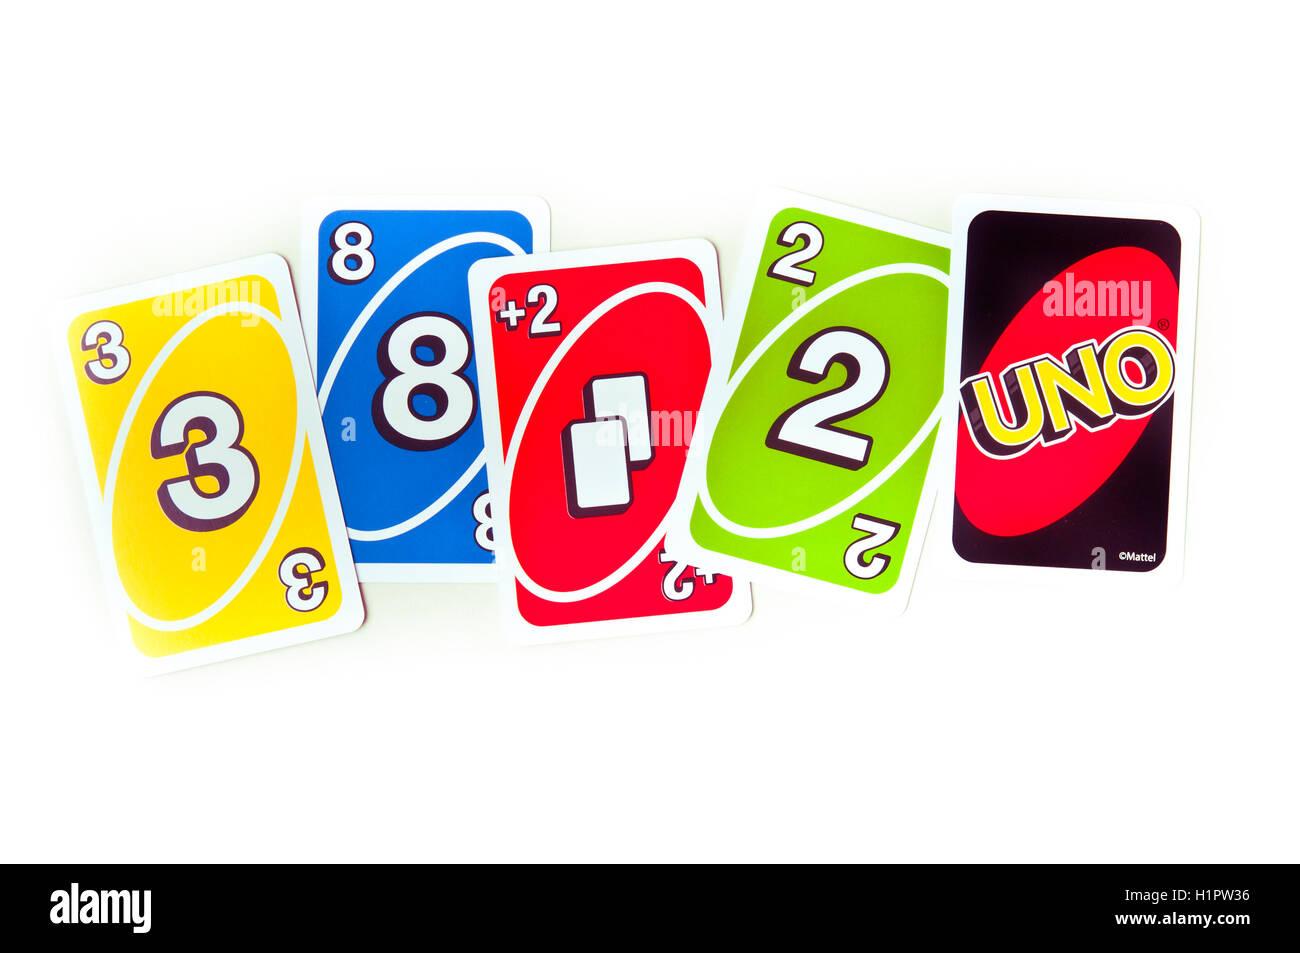 Uno Card Border Clip Art Clip Art Vector Site - Uno card template